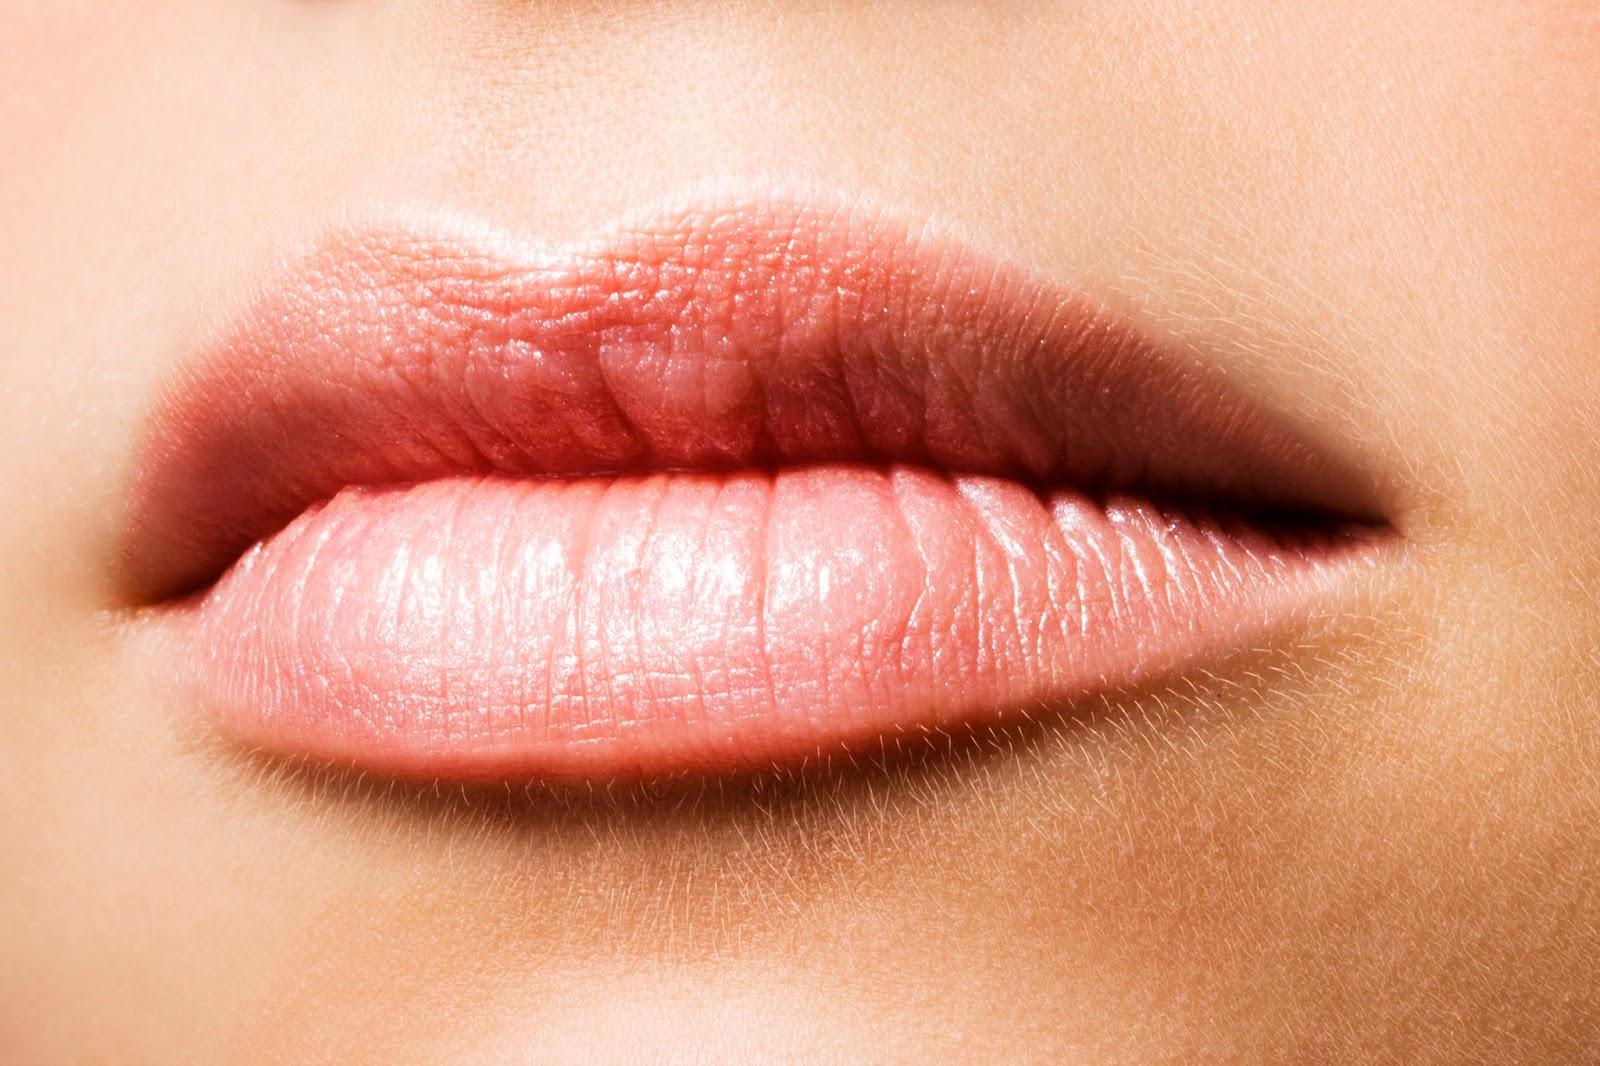 Cara Mengatasi Bibir Kering Secara Alami dan Mudah